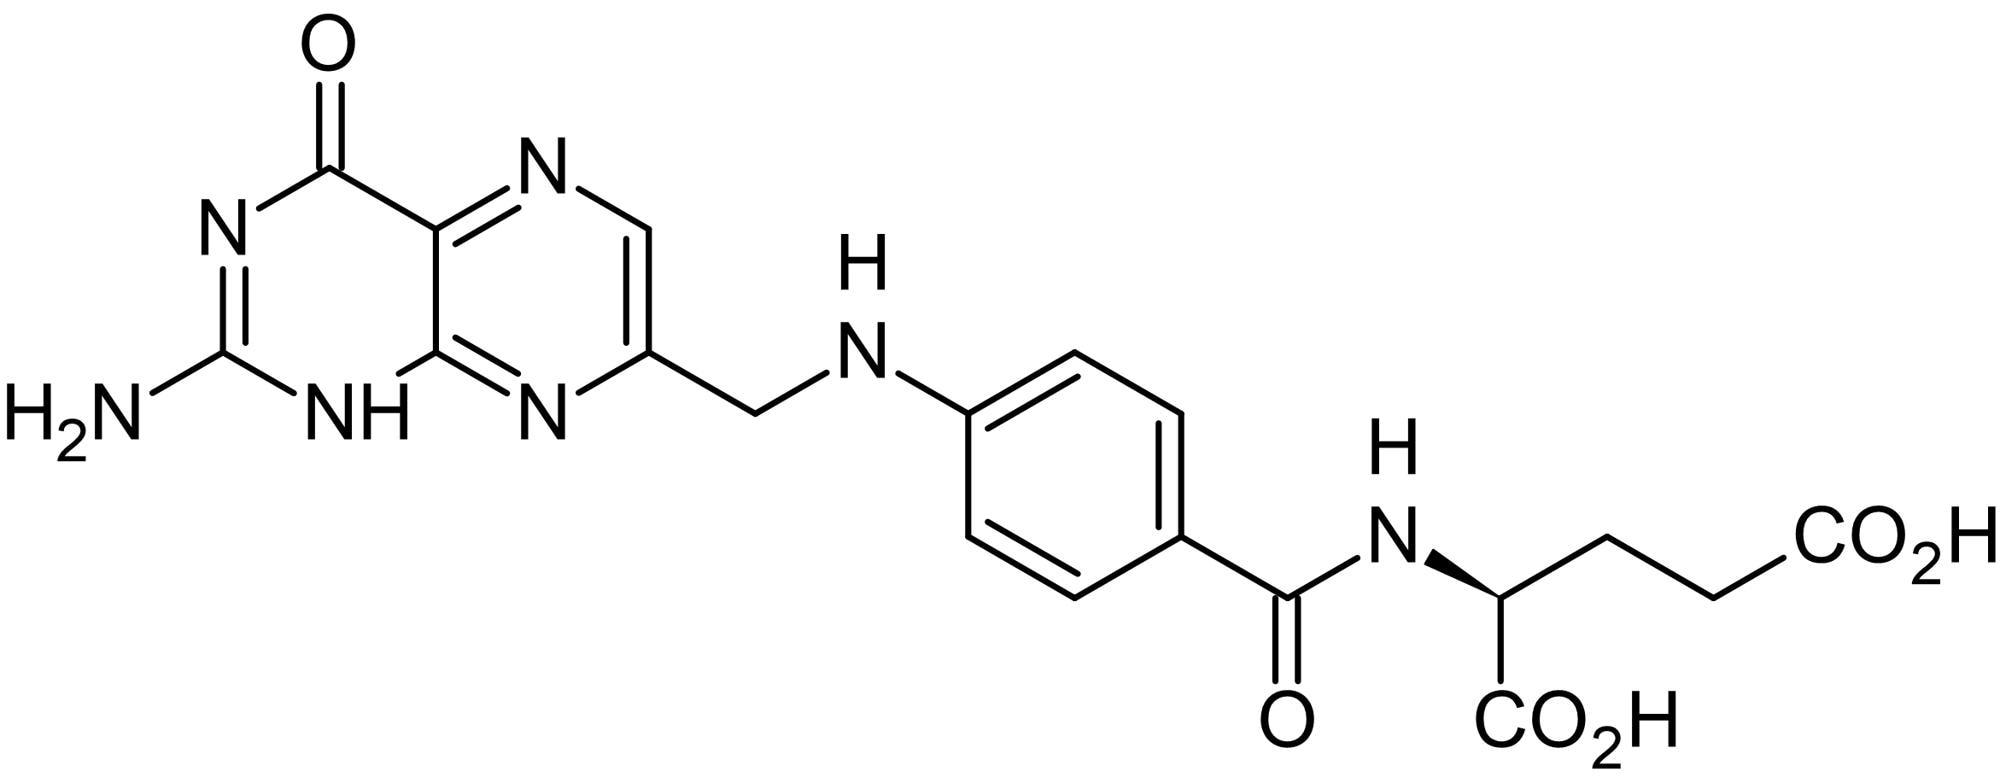 Chemical Structure - Folic acid (Folate), Synthetic vitamin B<sub>9</sub> (ab143621)